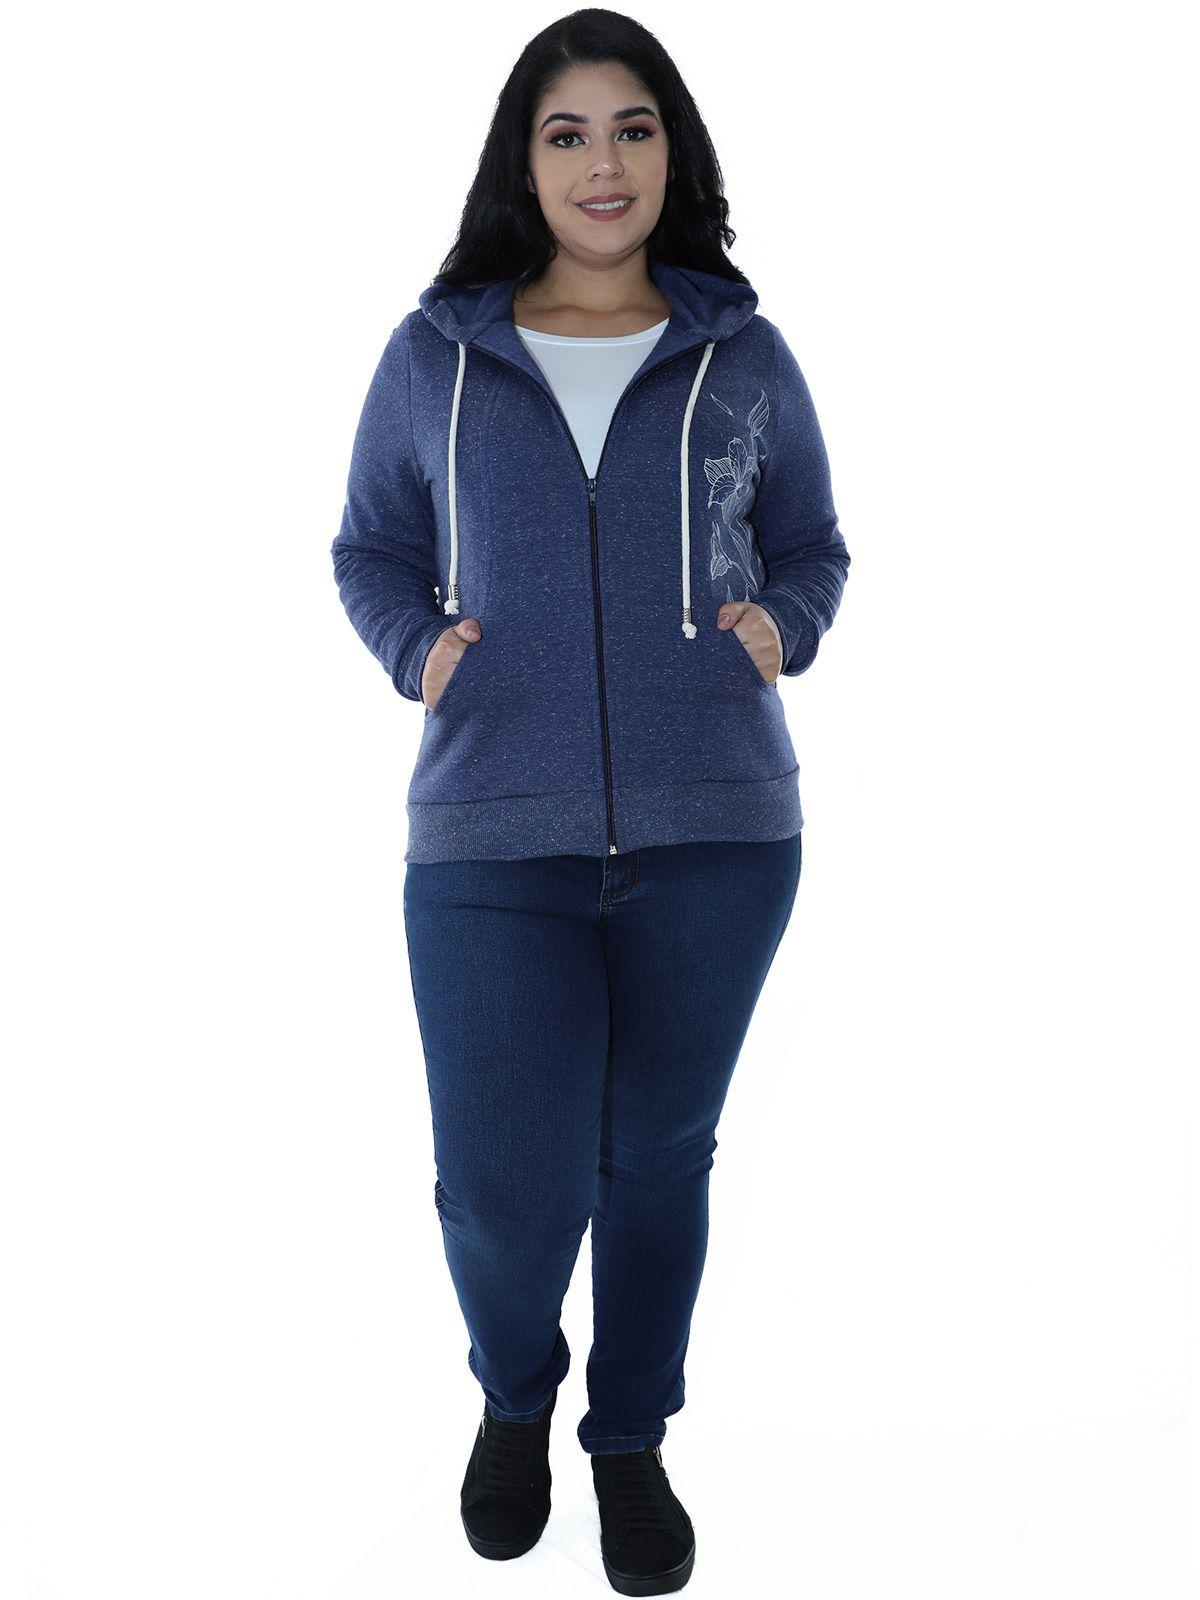 Casaco Plus Size Moletom Fleece Botonê Azul Marinho